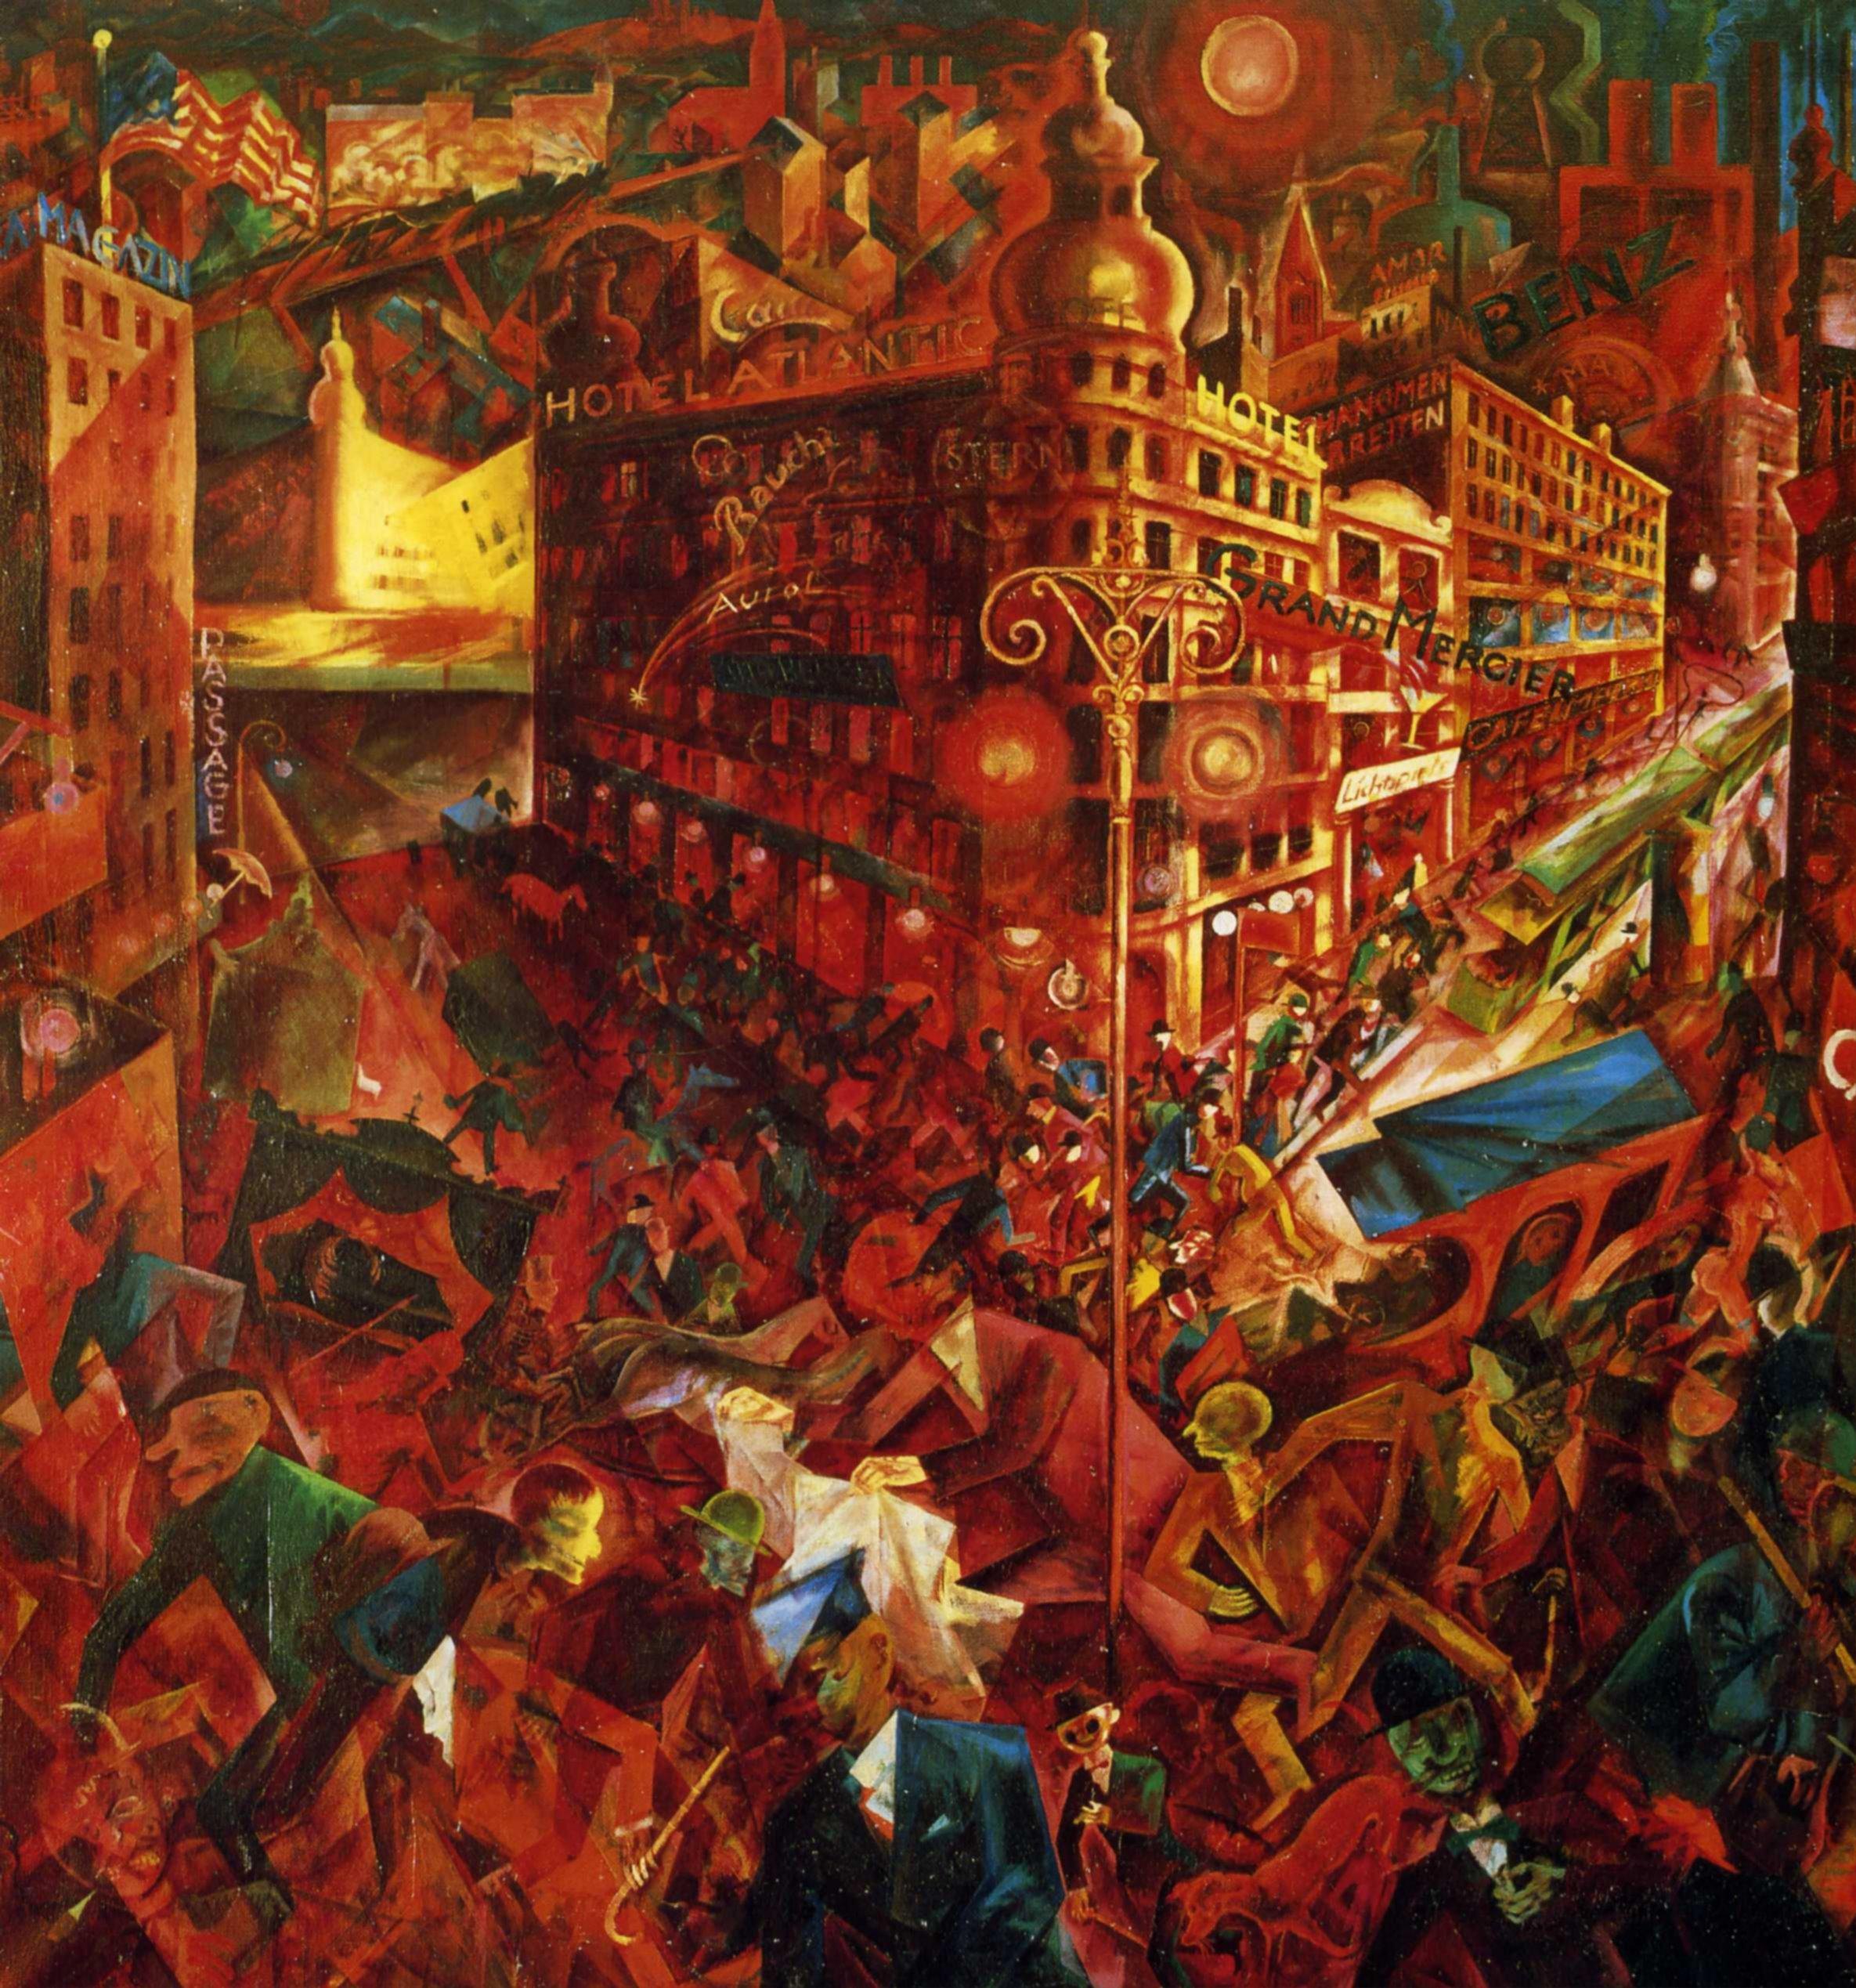 1916-1917 George Grosz - Overlooking the great view